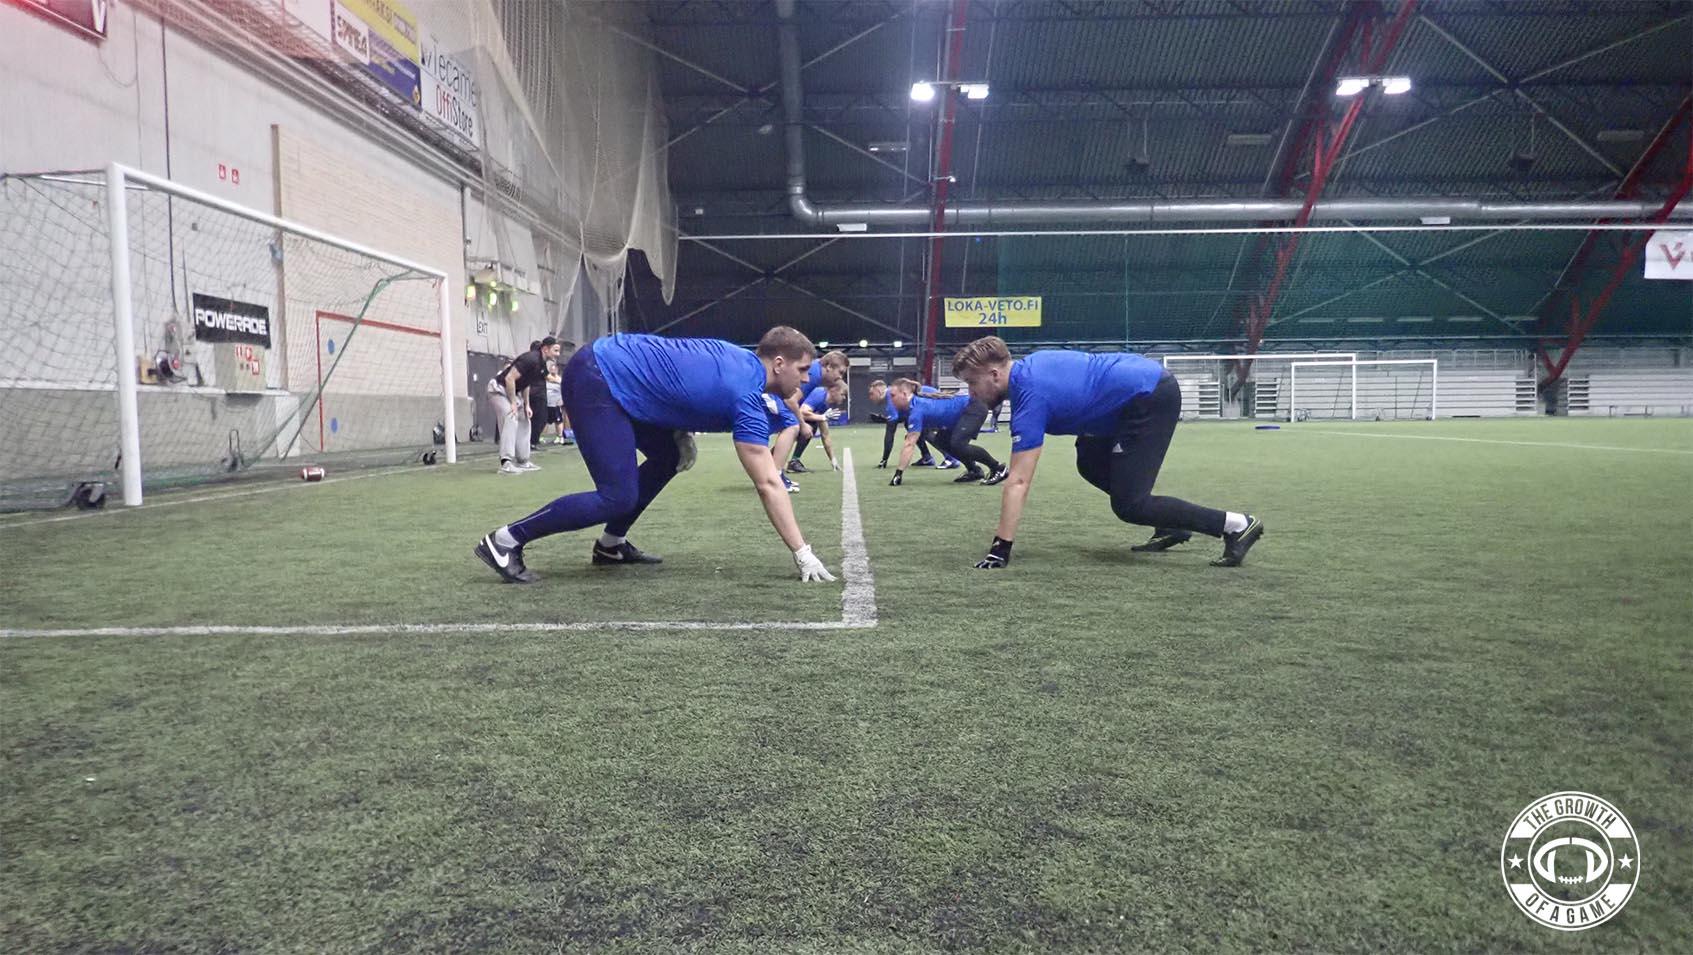 2019 Vantaa Skills Camp Players 4